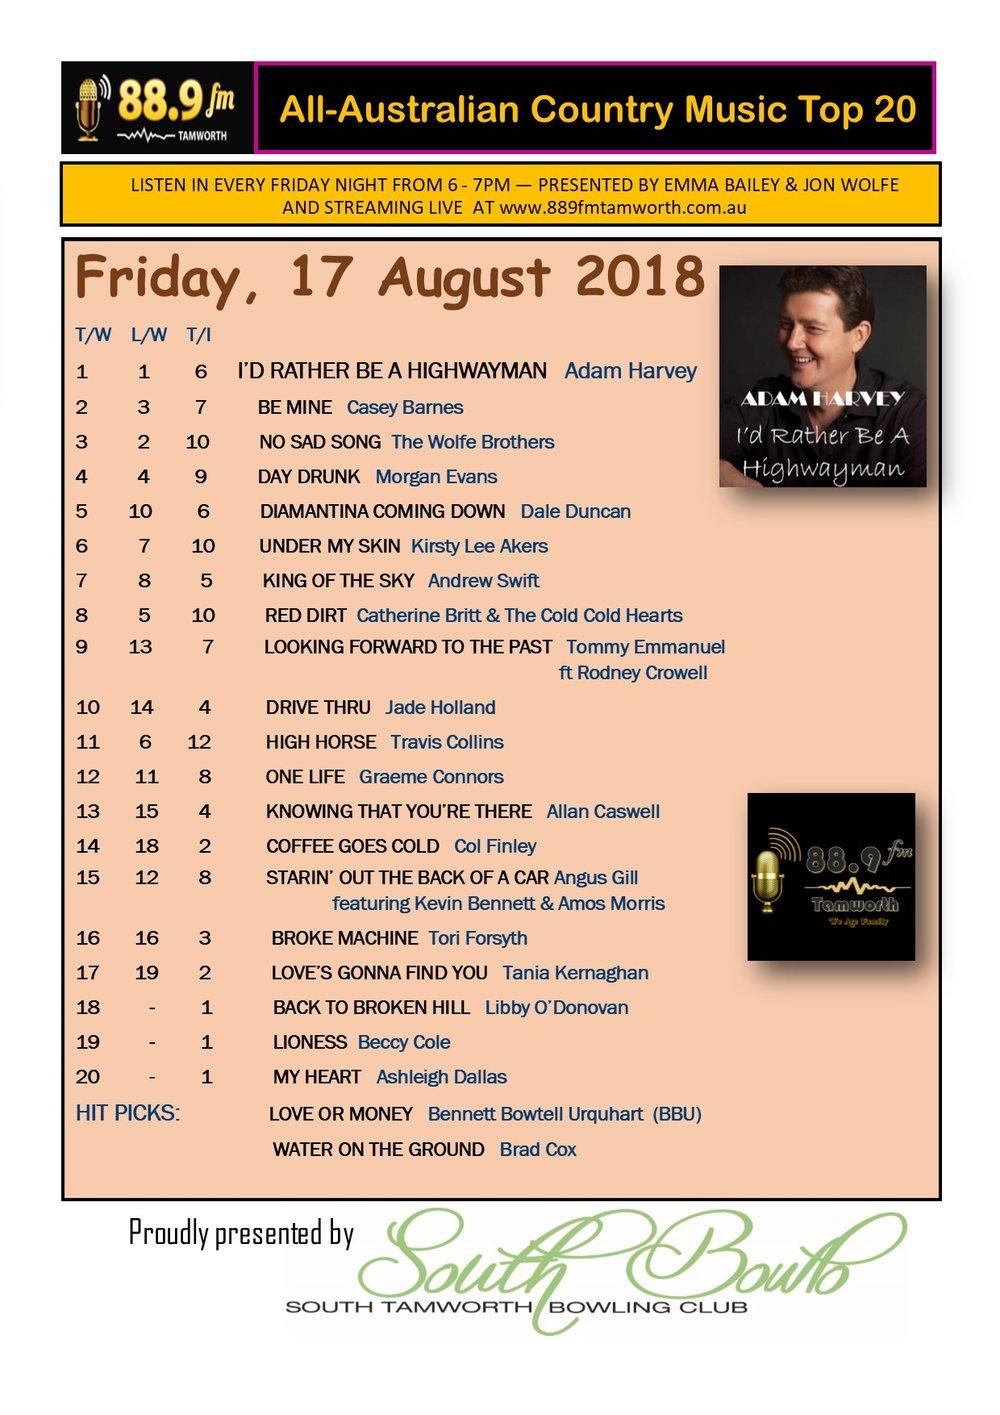 889FM CHART 17 August 2018.jpg